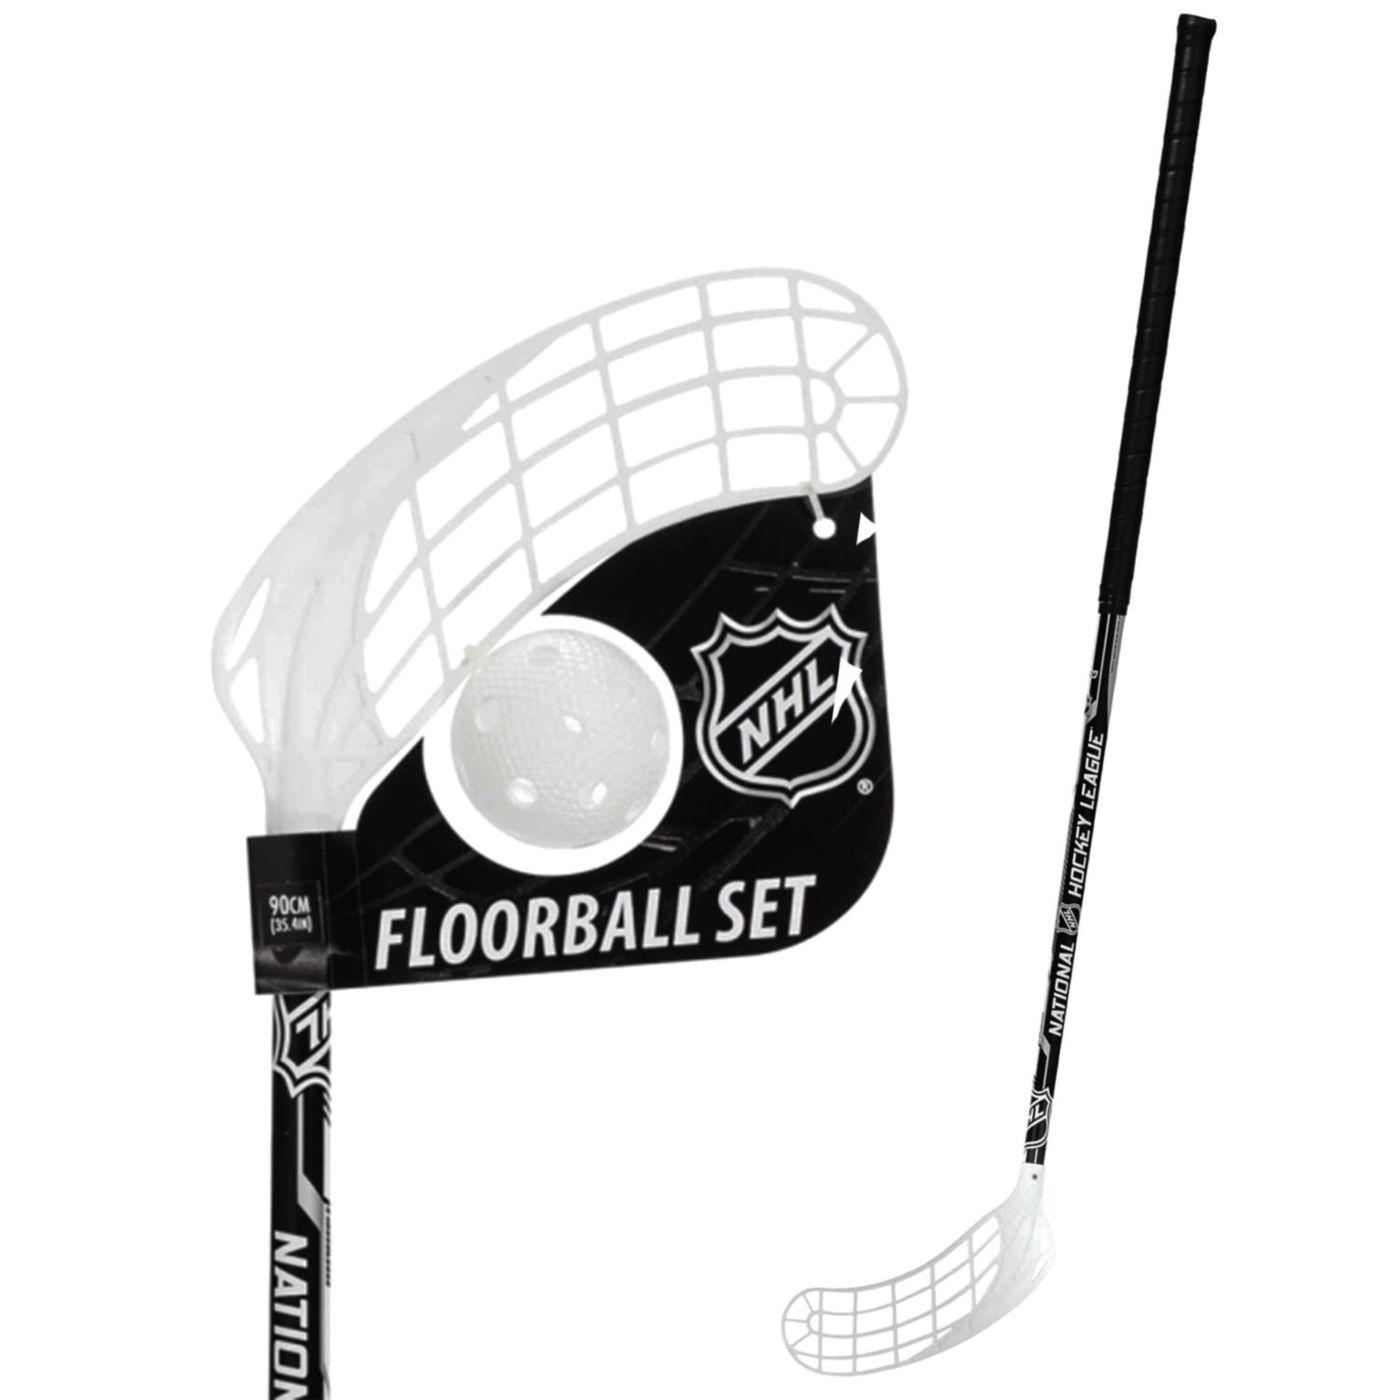 Franklin Floorball Stick Set